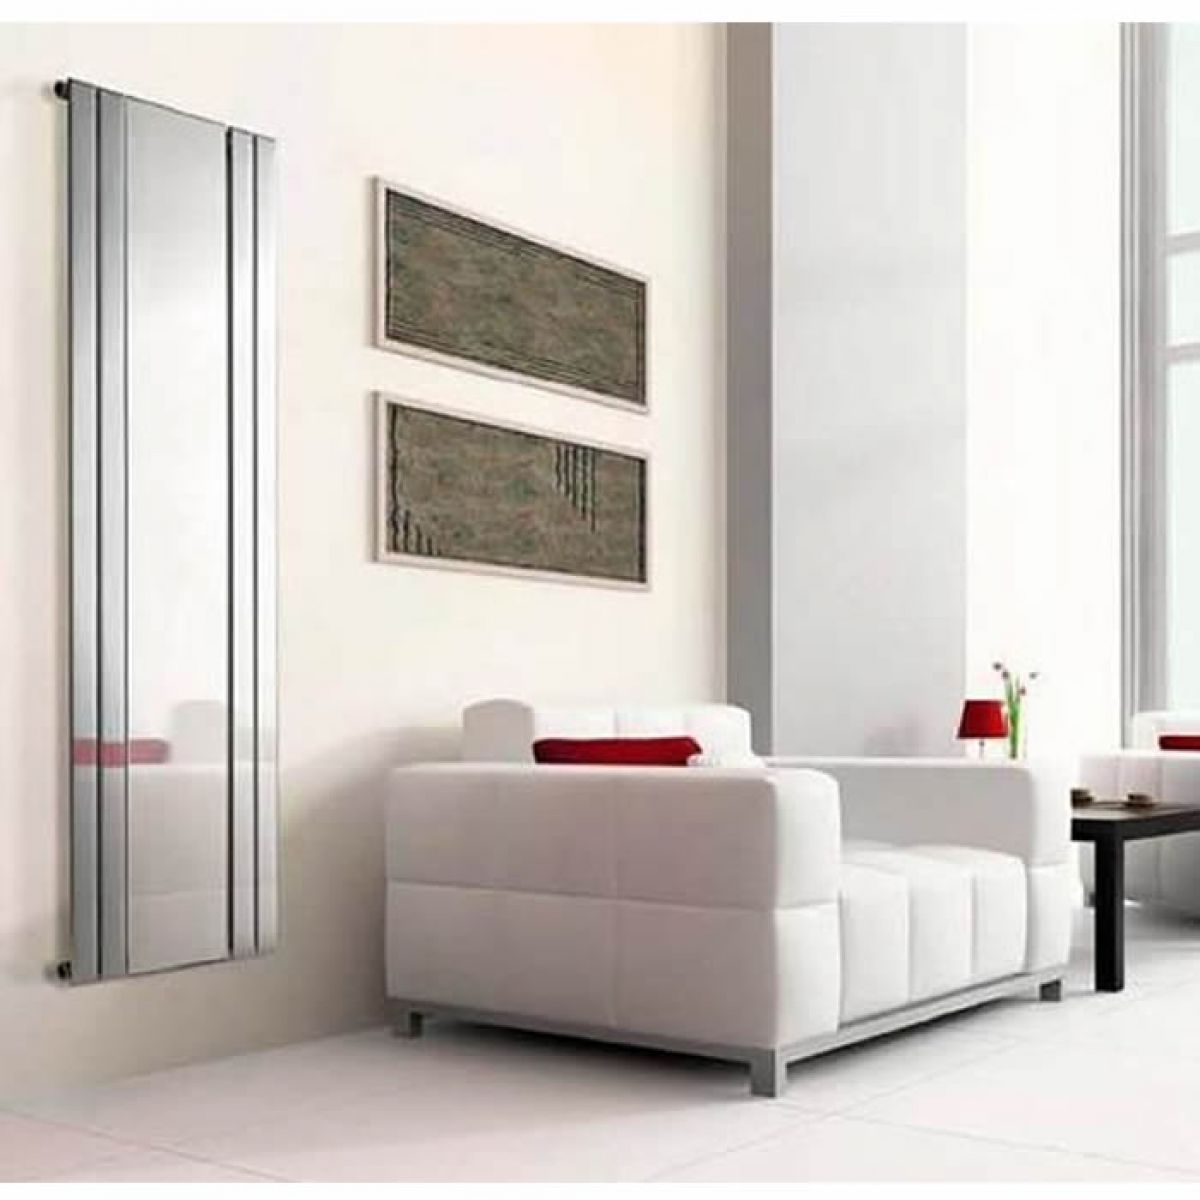 Apollo capri vertical chrome radiator with mirror uk for Mirror radiator